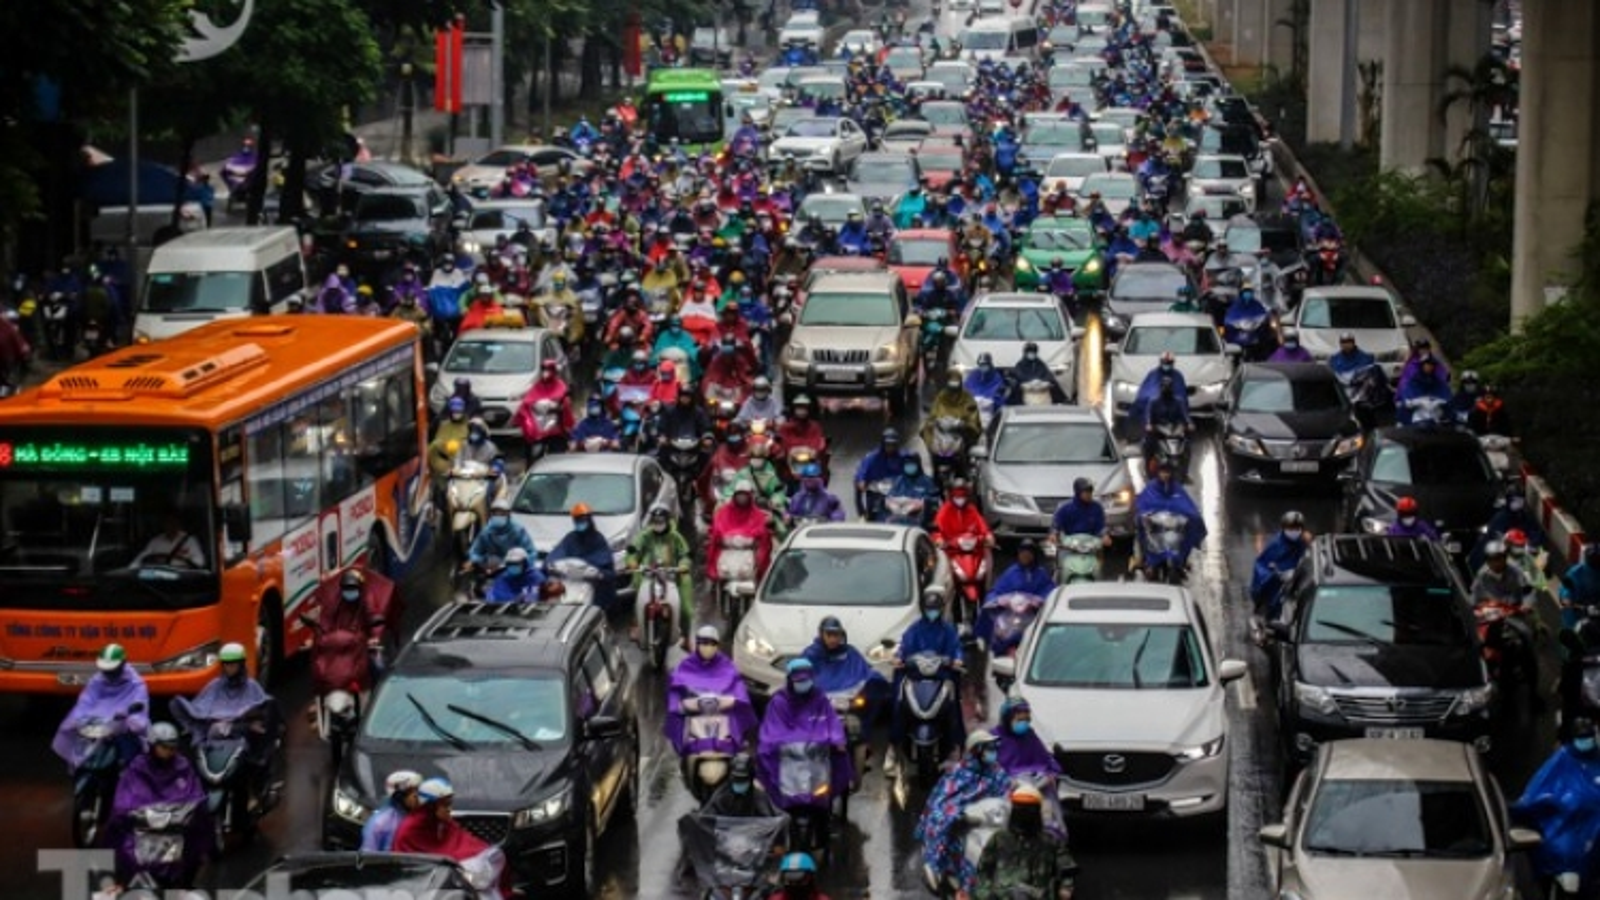 Heavy rain leaves Hanoi streets suffering severe traffic jams